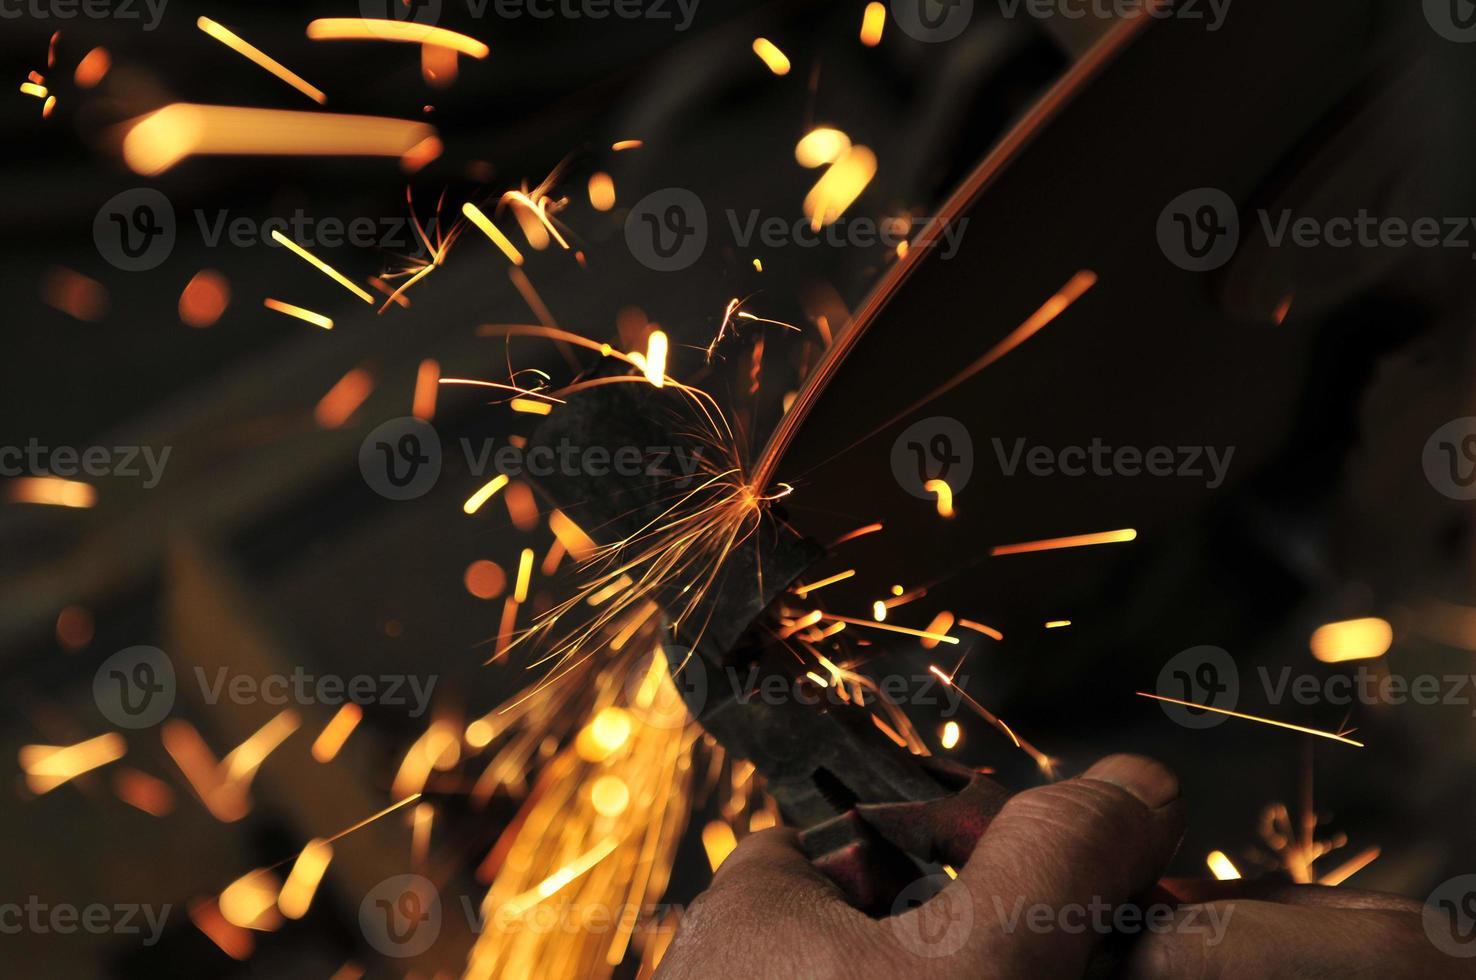 étincelle fonderie industrie photo